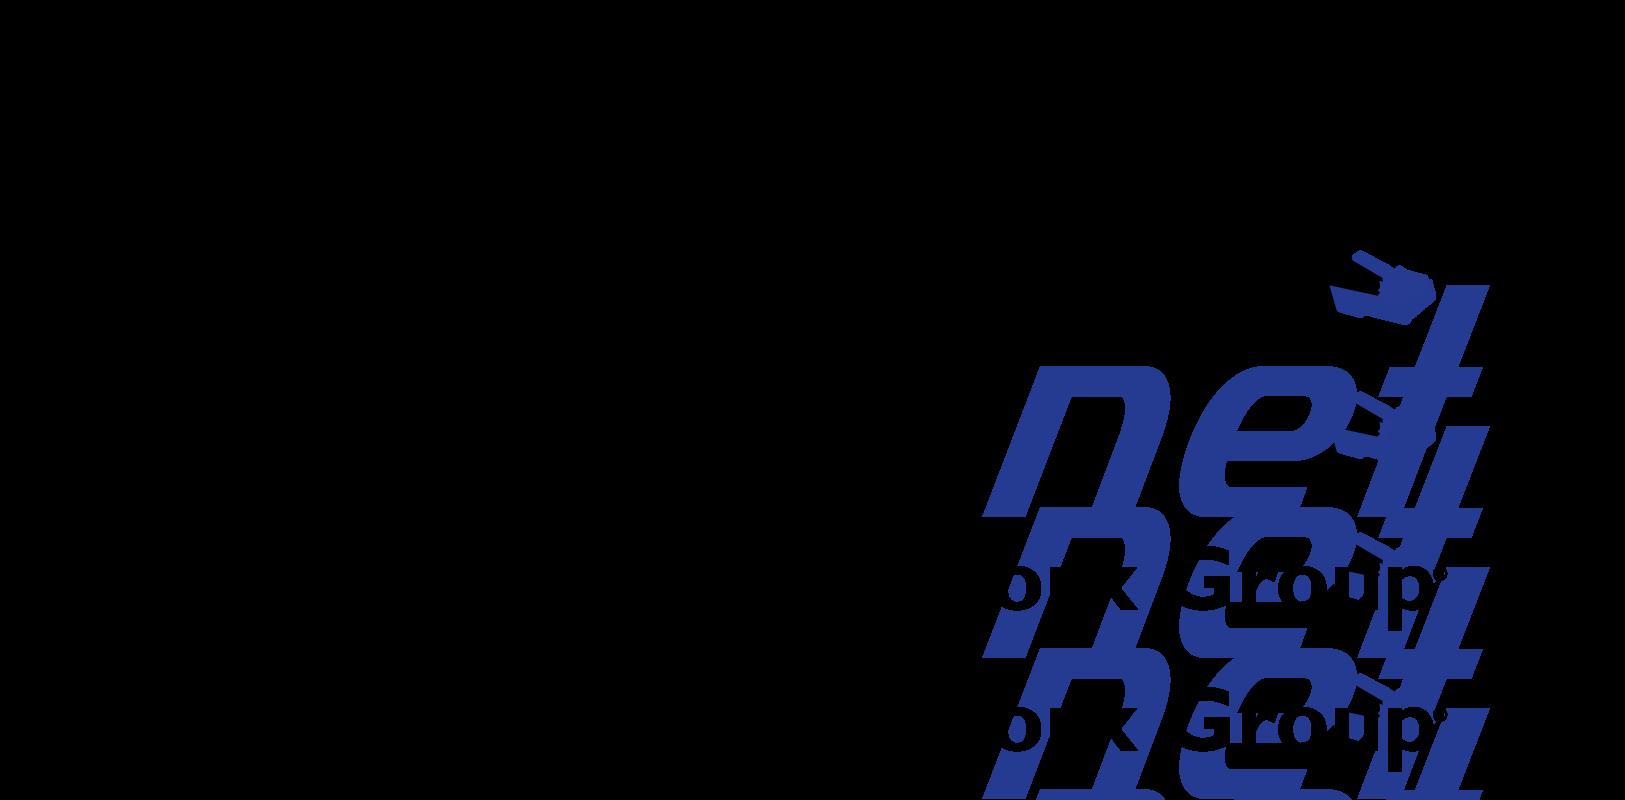 Ridgenet Network Group